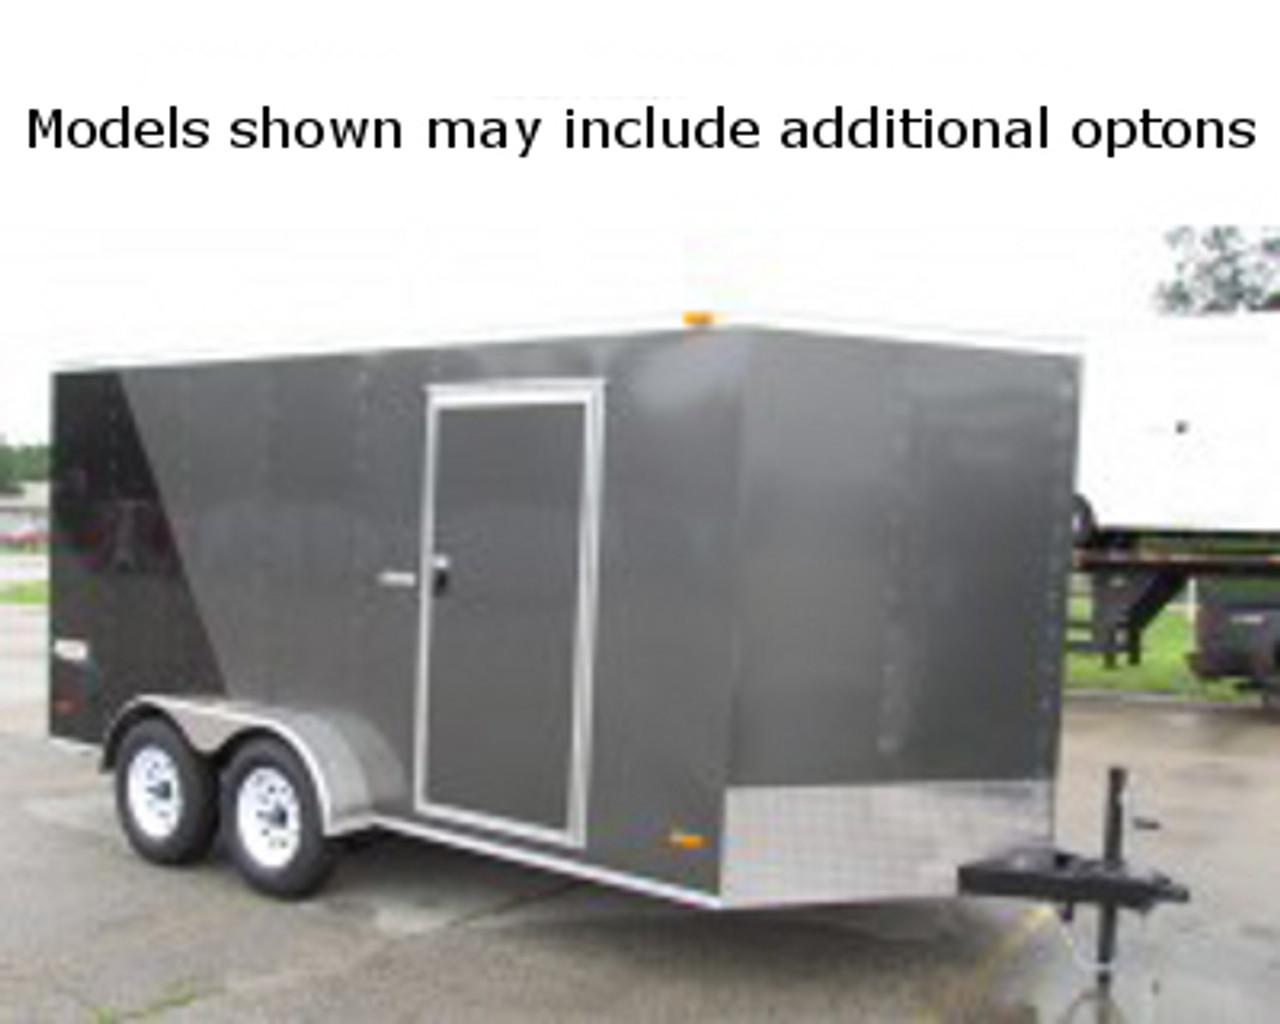 SC714TA2DGT --- 7' X 14' Enclosed Tandem Trailer with Double Rear Doors - Torsion - Bravo